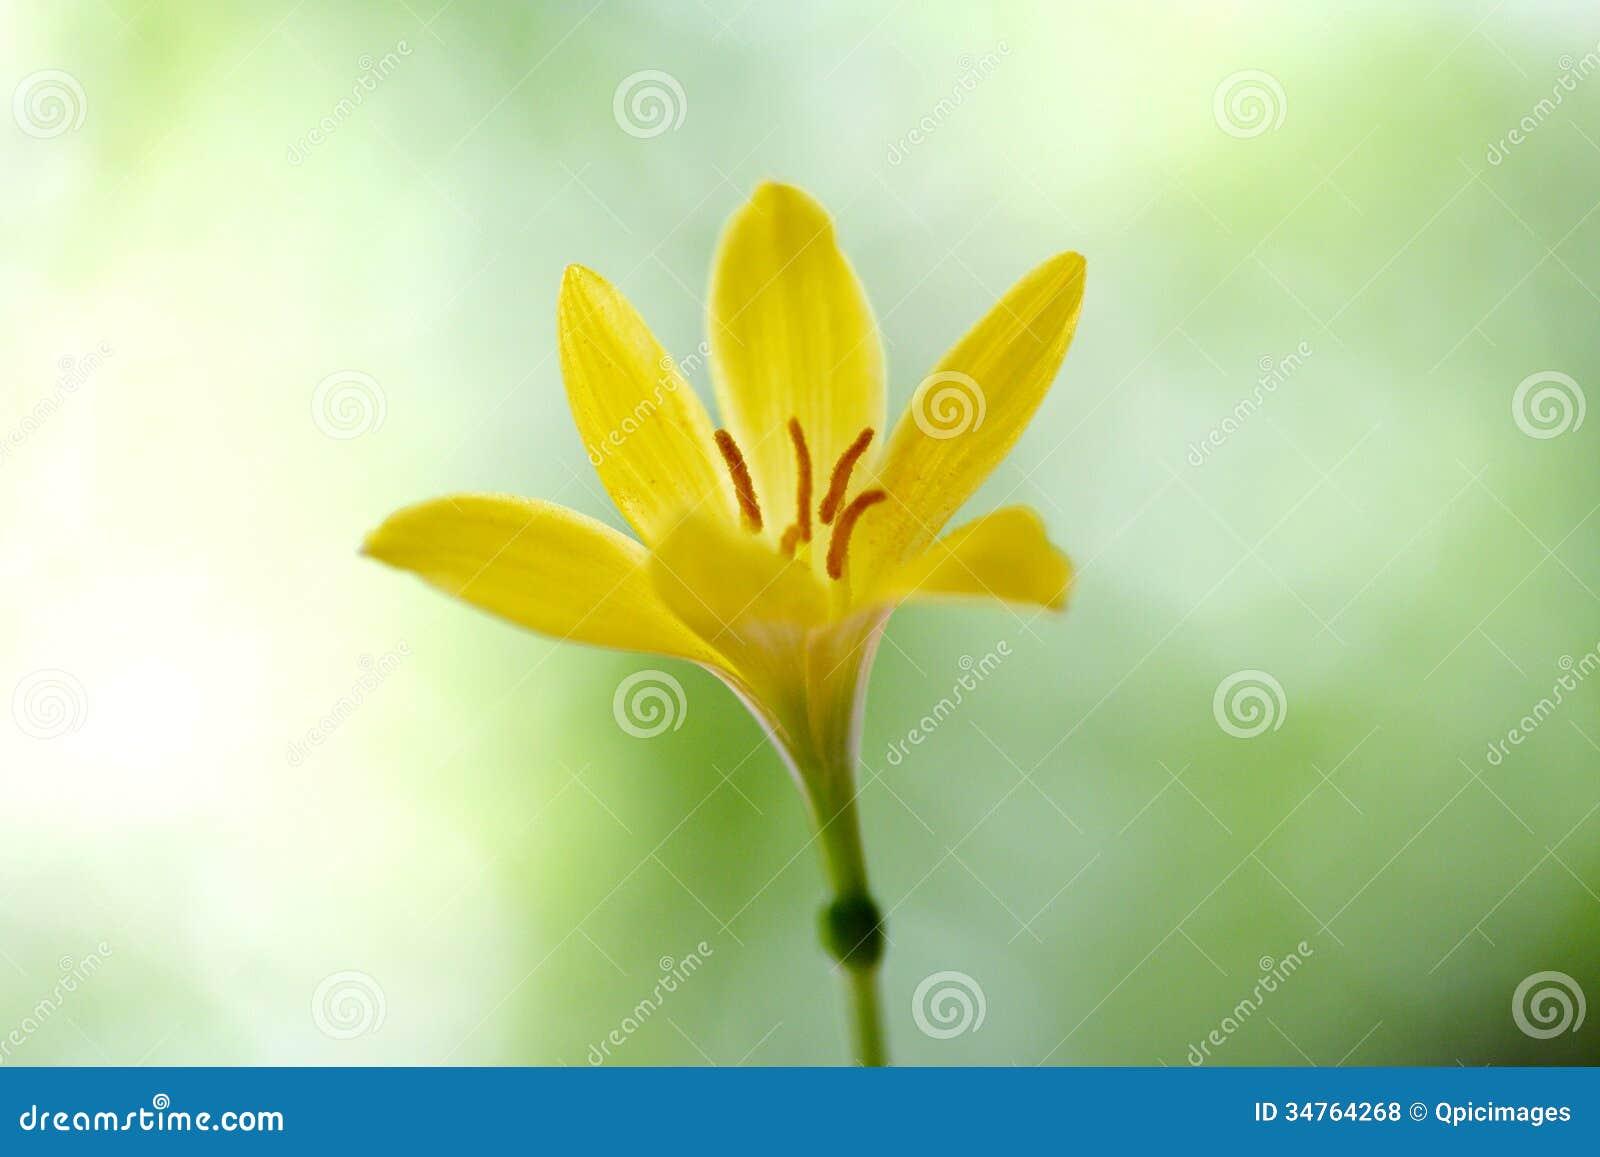 Yellow Crocus Flower Stock Photo Image Of Closeup Shallow 34764268